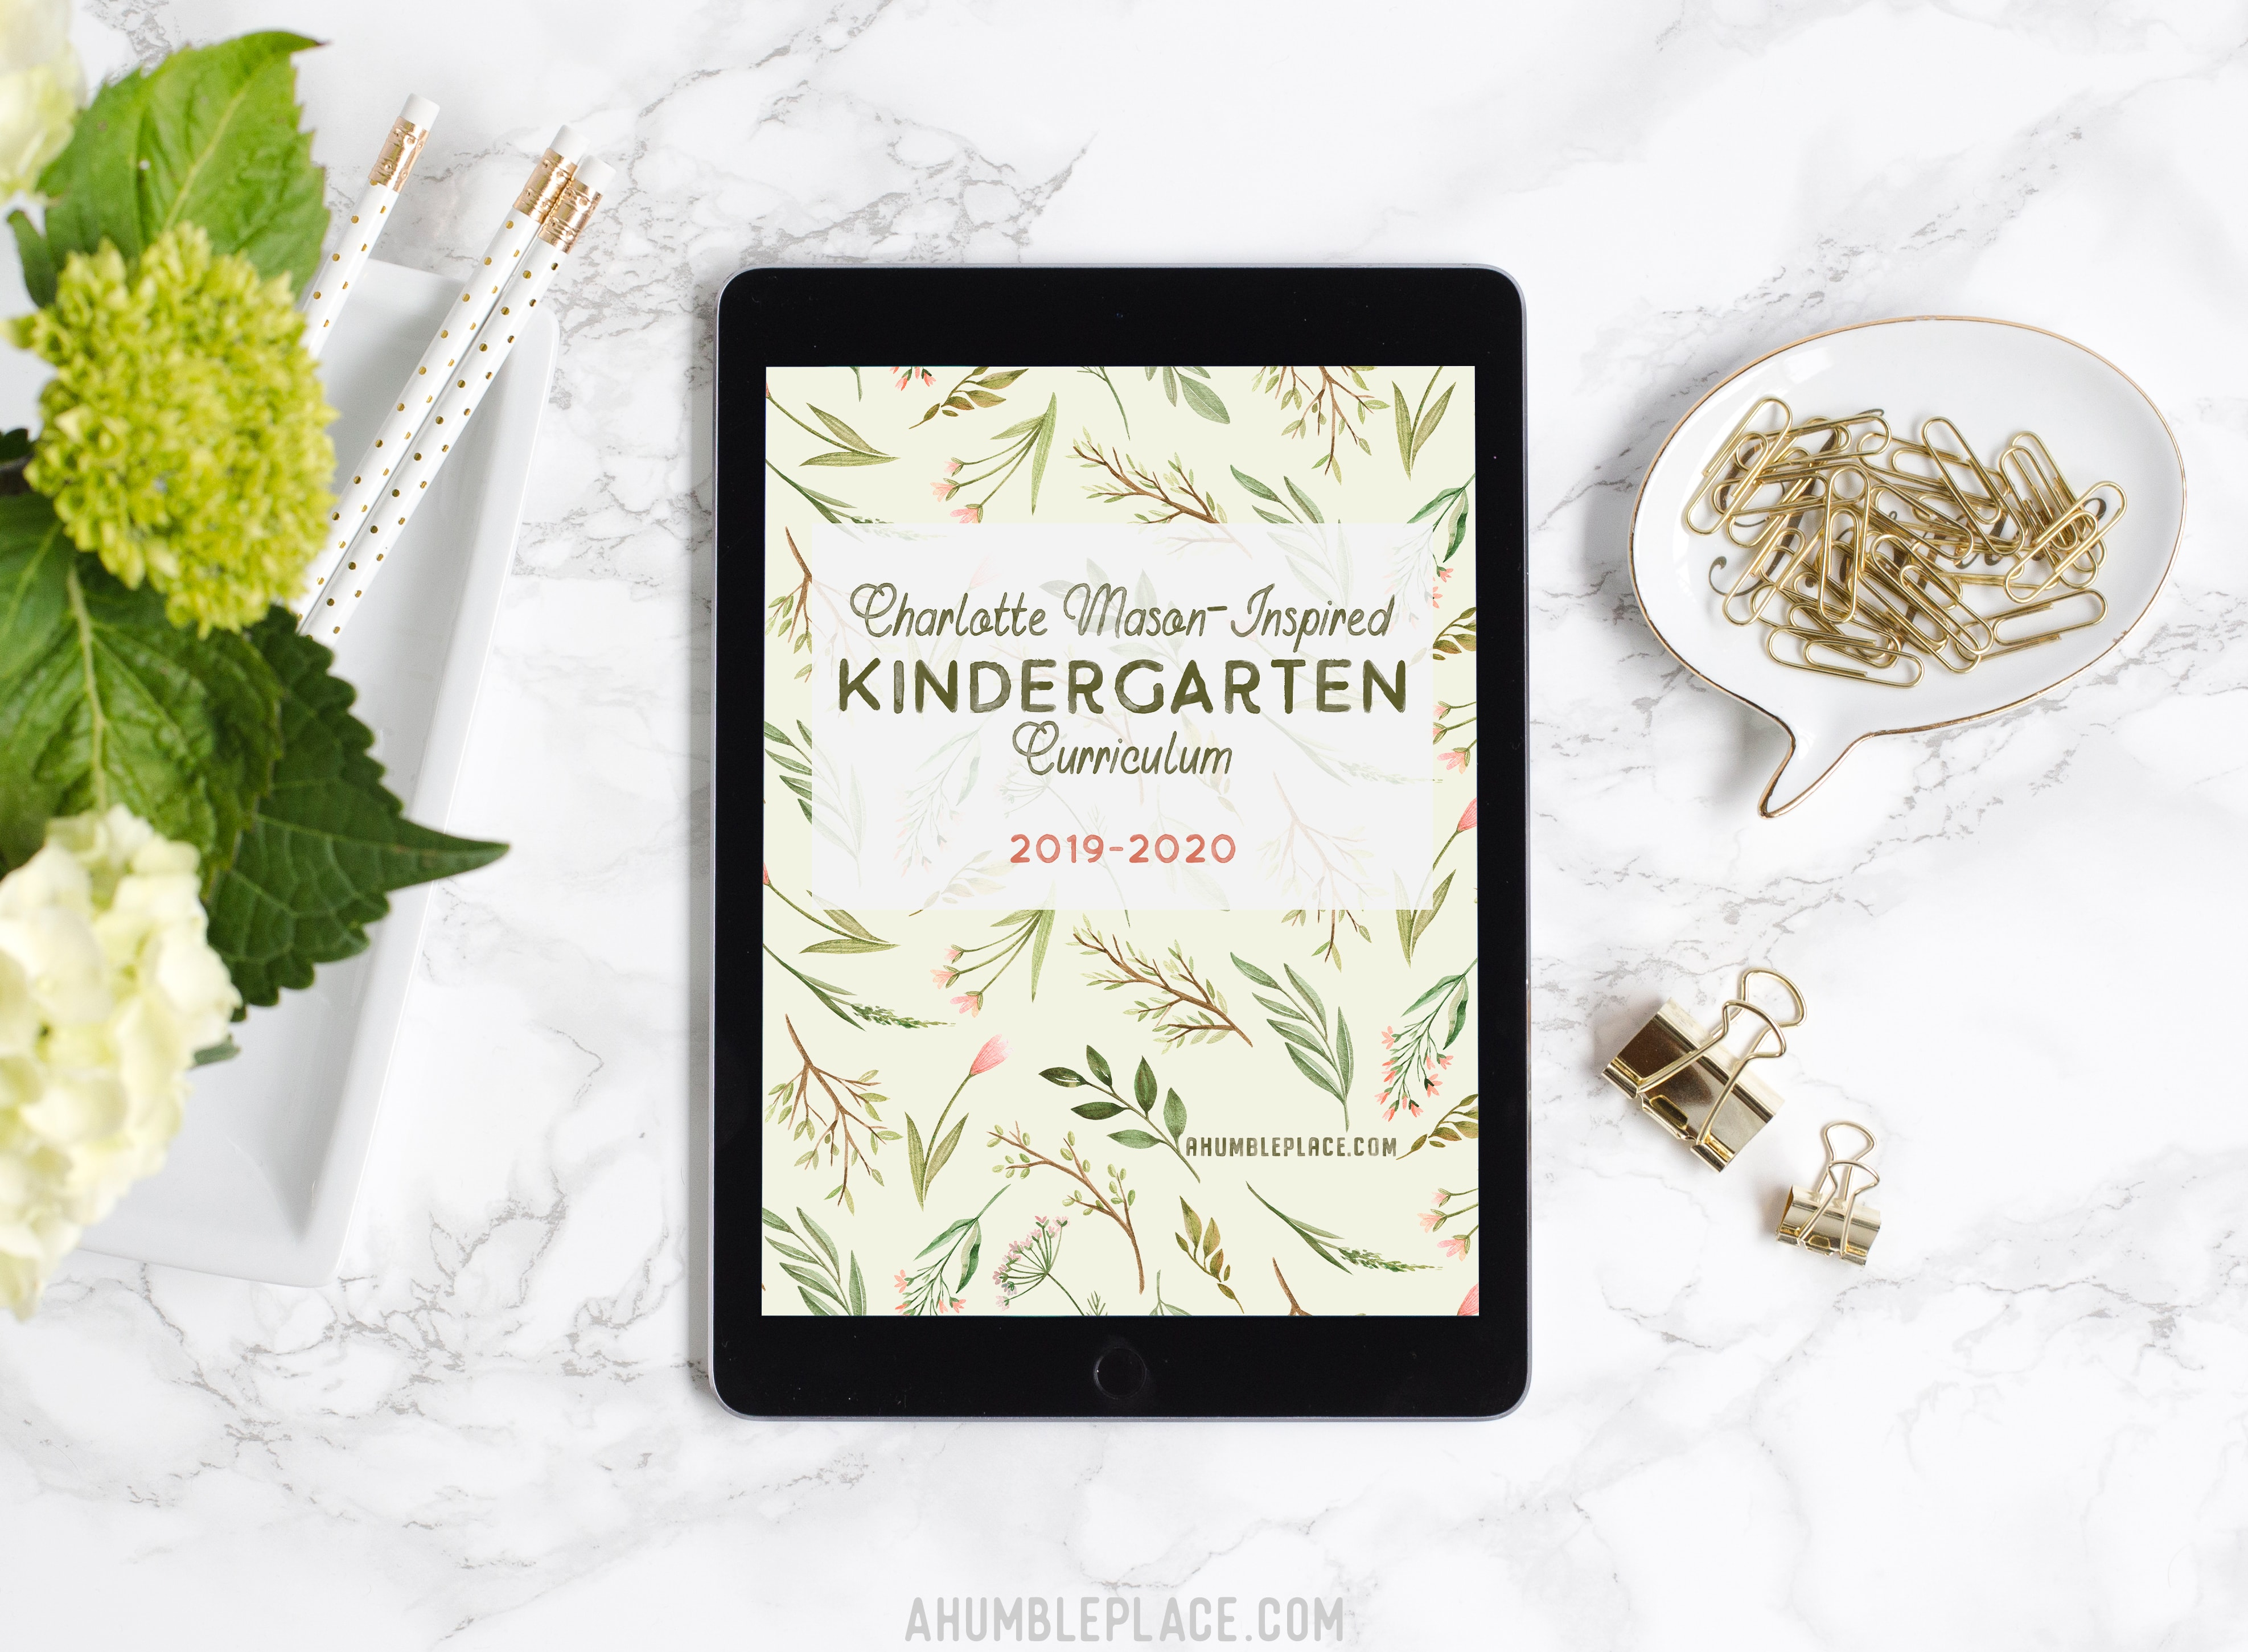 Charlotte Mason-Inspired Kindergarten Curriculum (Free Booklist with regard to Homeschool Year At A Glance 2019-2020 Botanical Calendar Printable Free